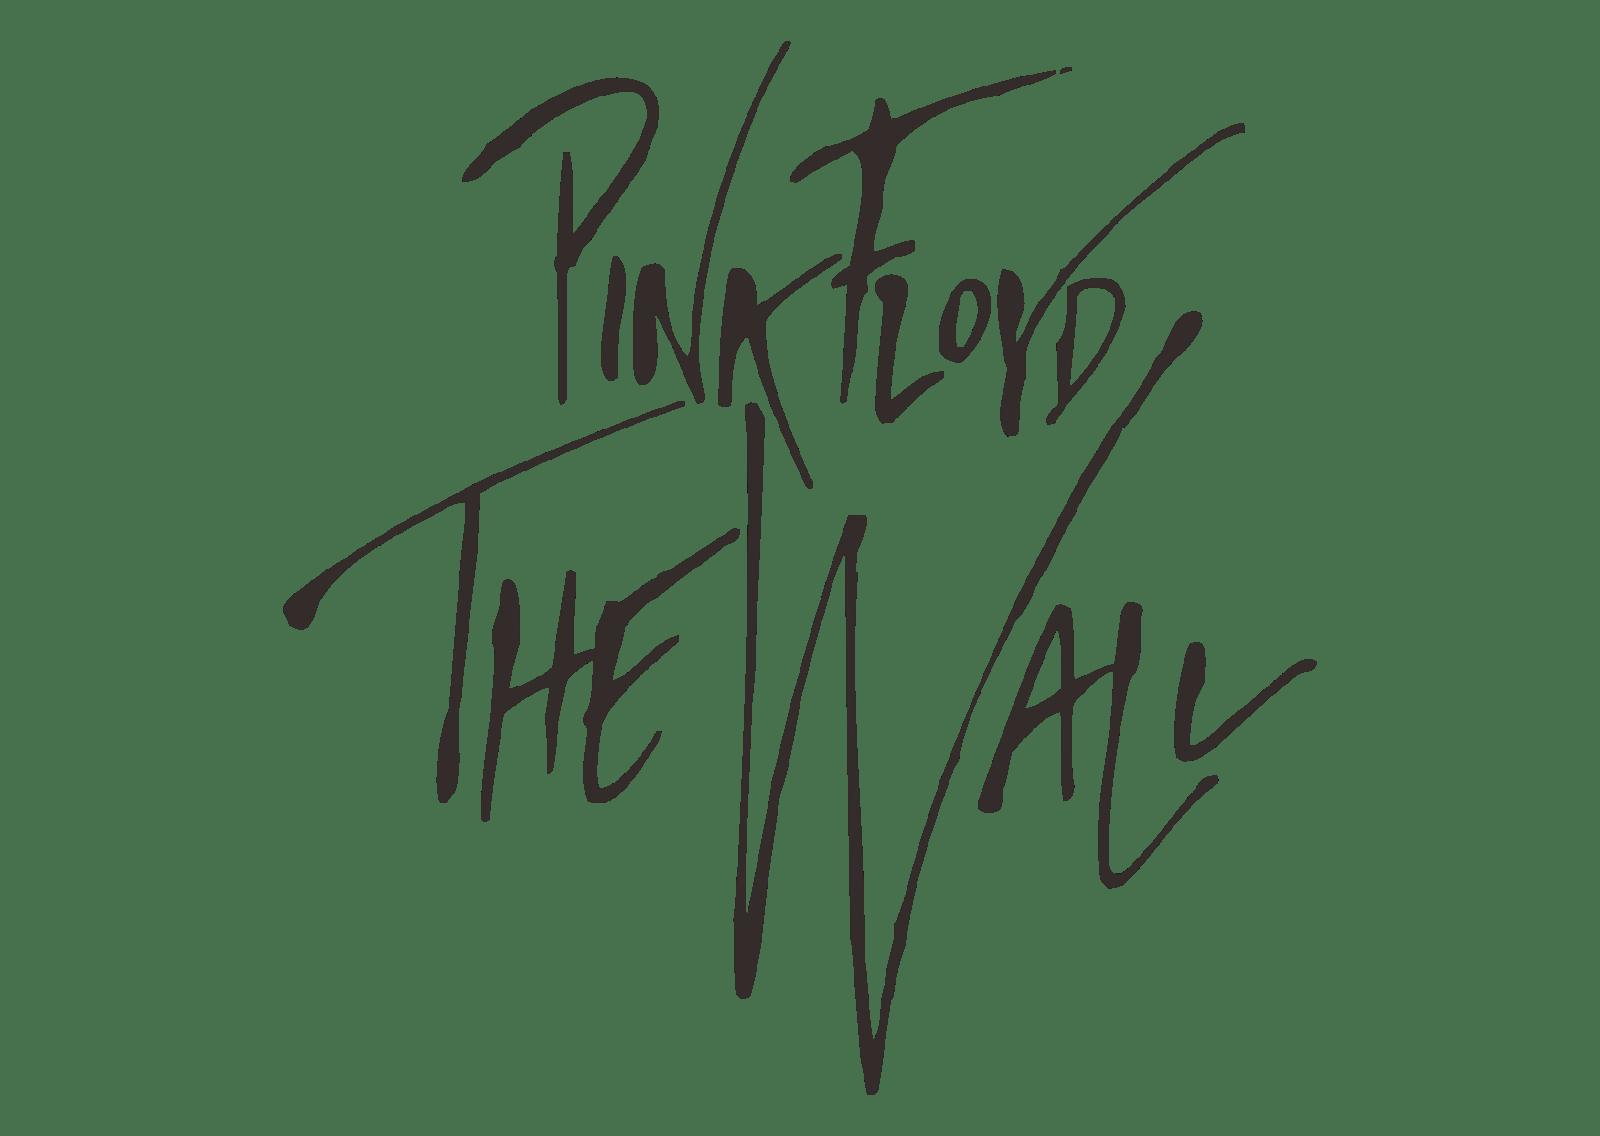 A537 Auto Adesivo Banda Pink Floyd